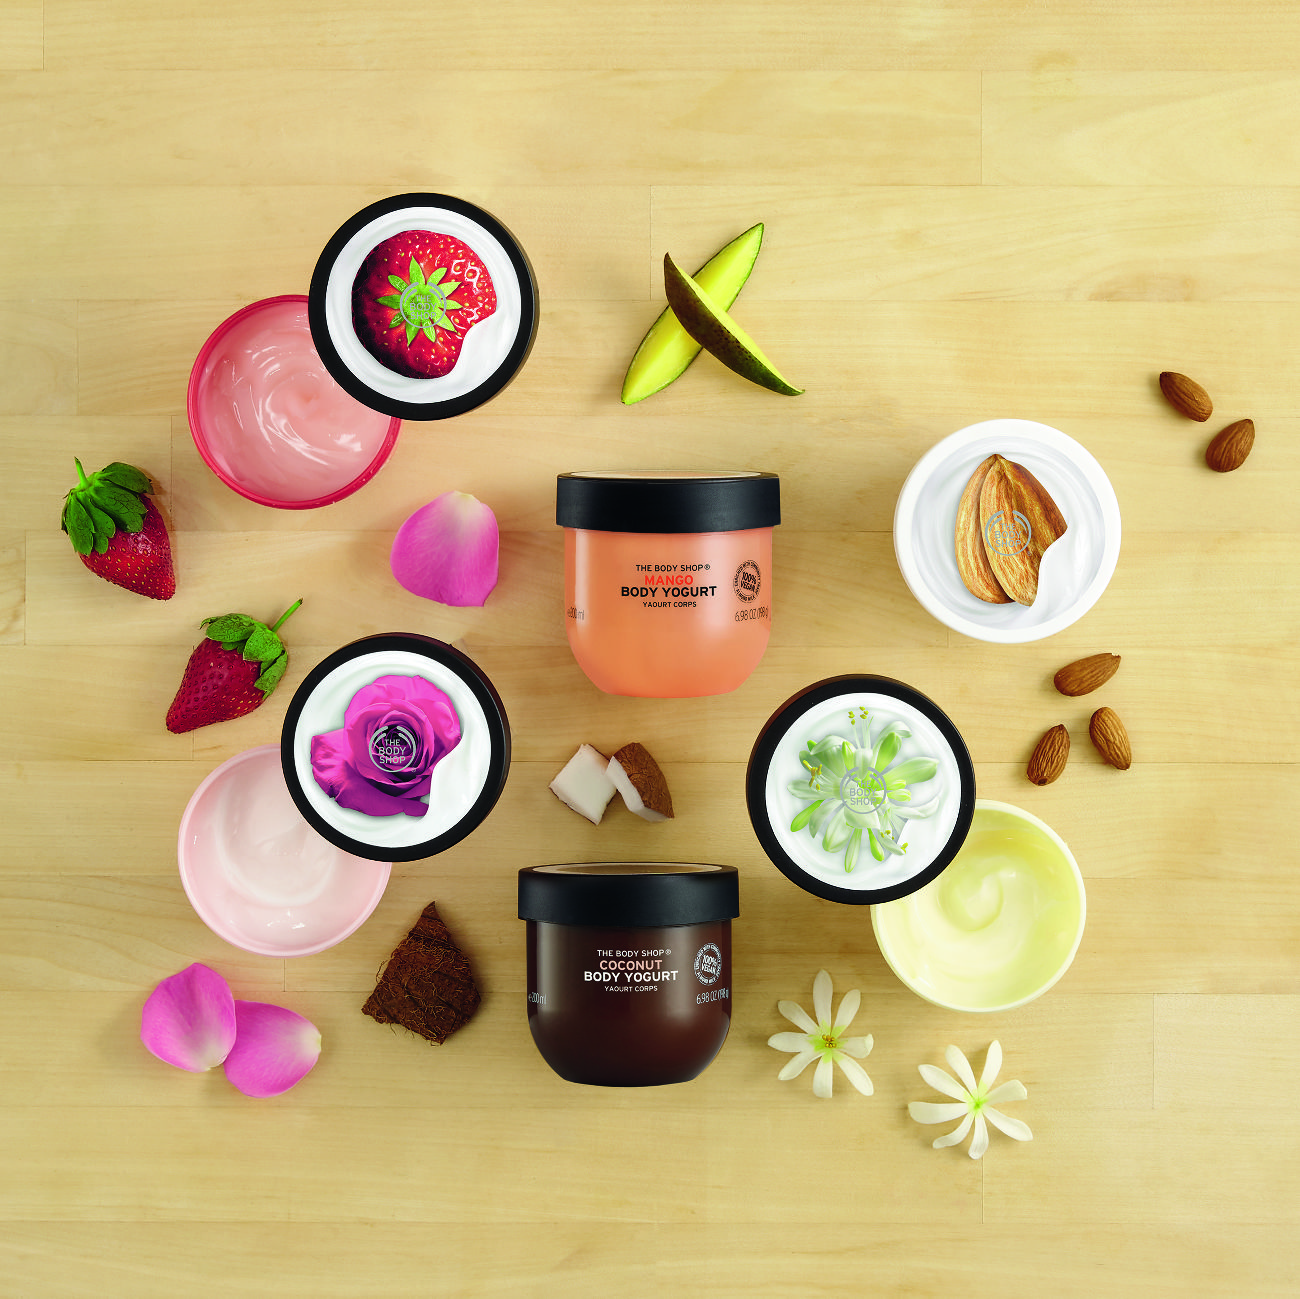 Body Yoghurt